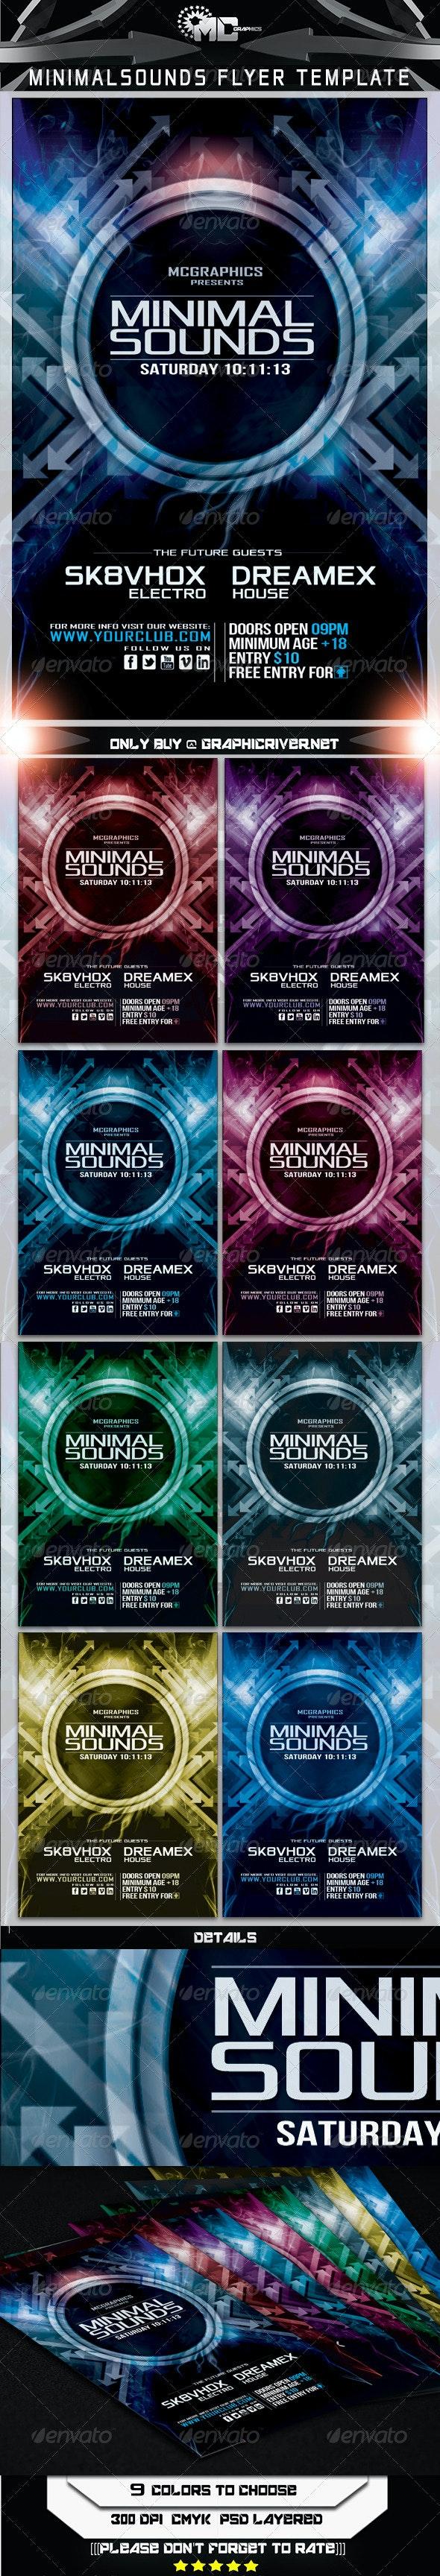 Minimal Sounds Flyer Template - Print Templates